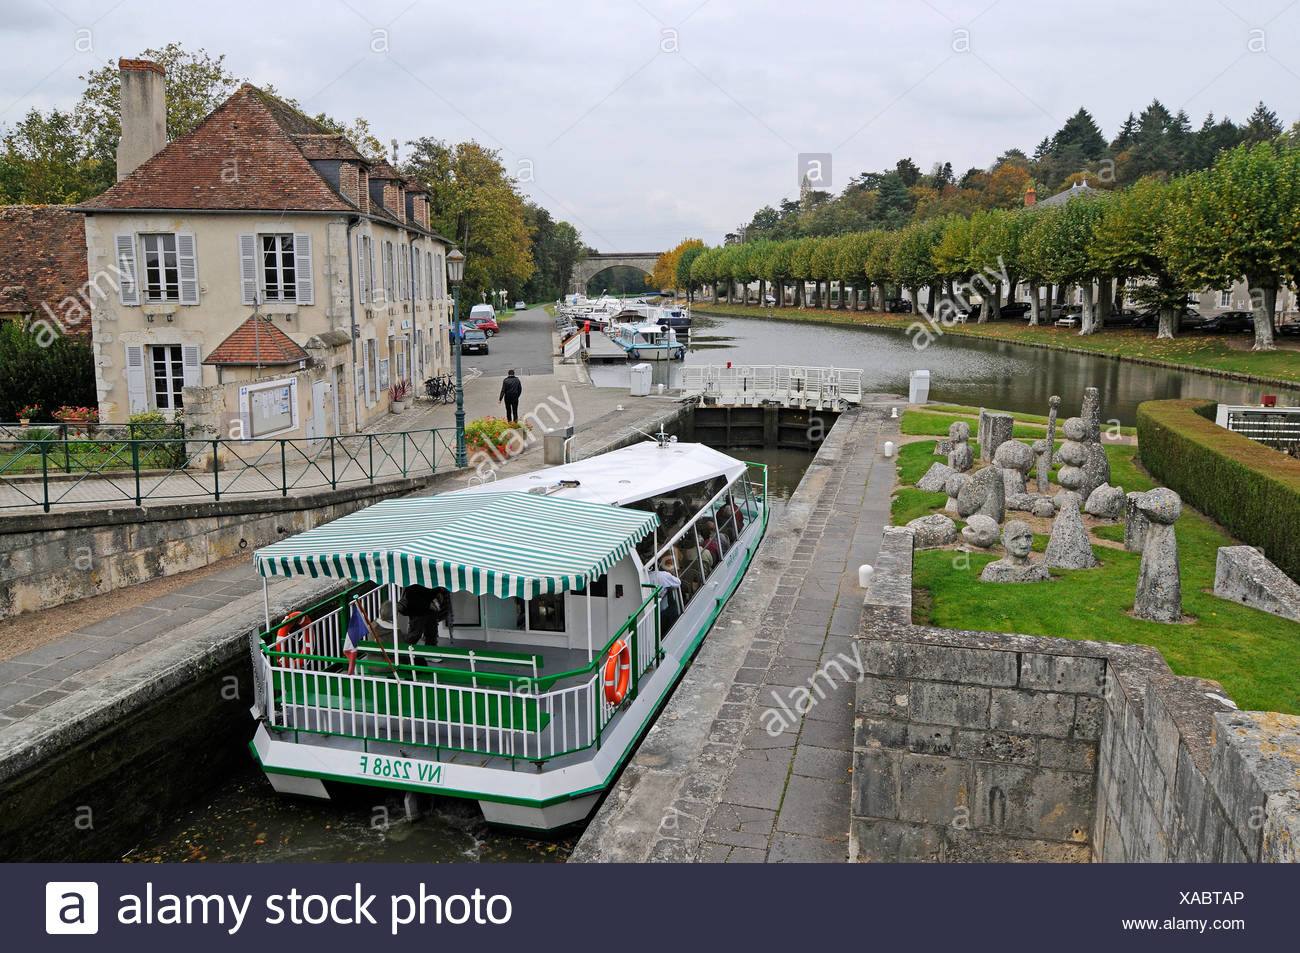 Ship in the lock, Canal latéral à la Loire, Loire side channel, Briare, Loiret, Centre, France, Europe, PublicGround - Stock Image